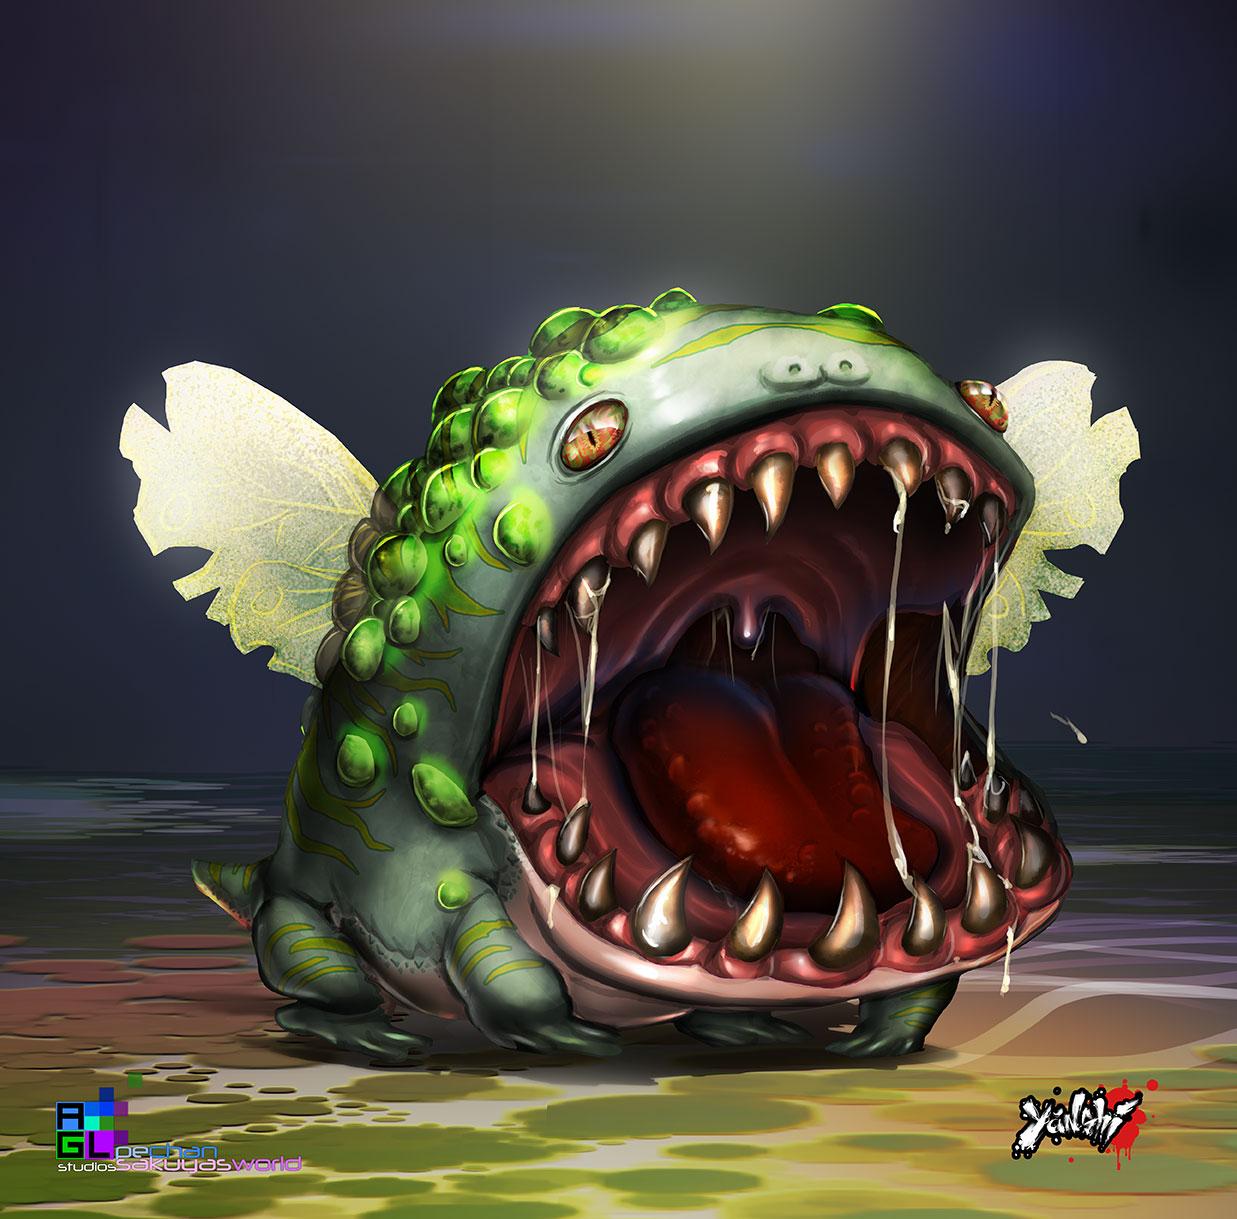 Potbelly beast